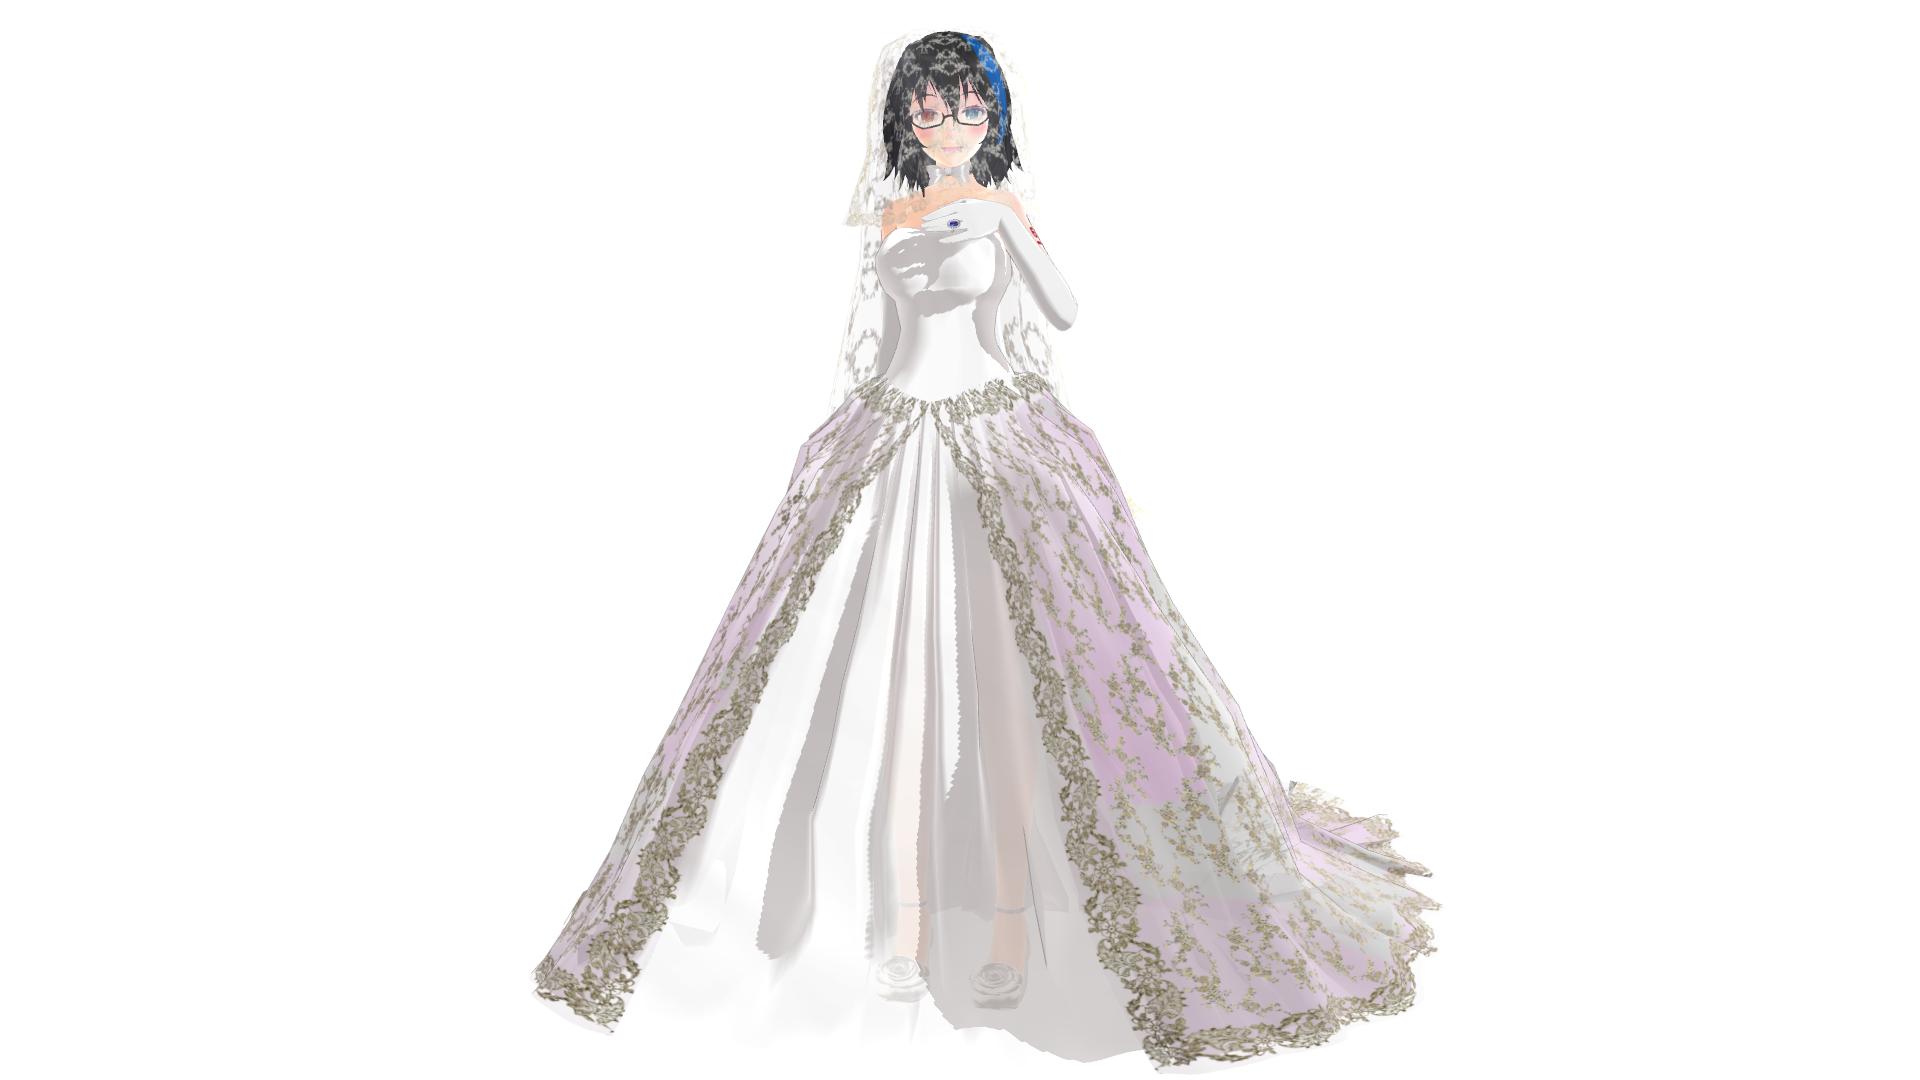 Tda Yokune Ruko Wedding Dress Download By Palcario On DeviantArt - Anime Wedding Dress